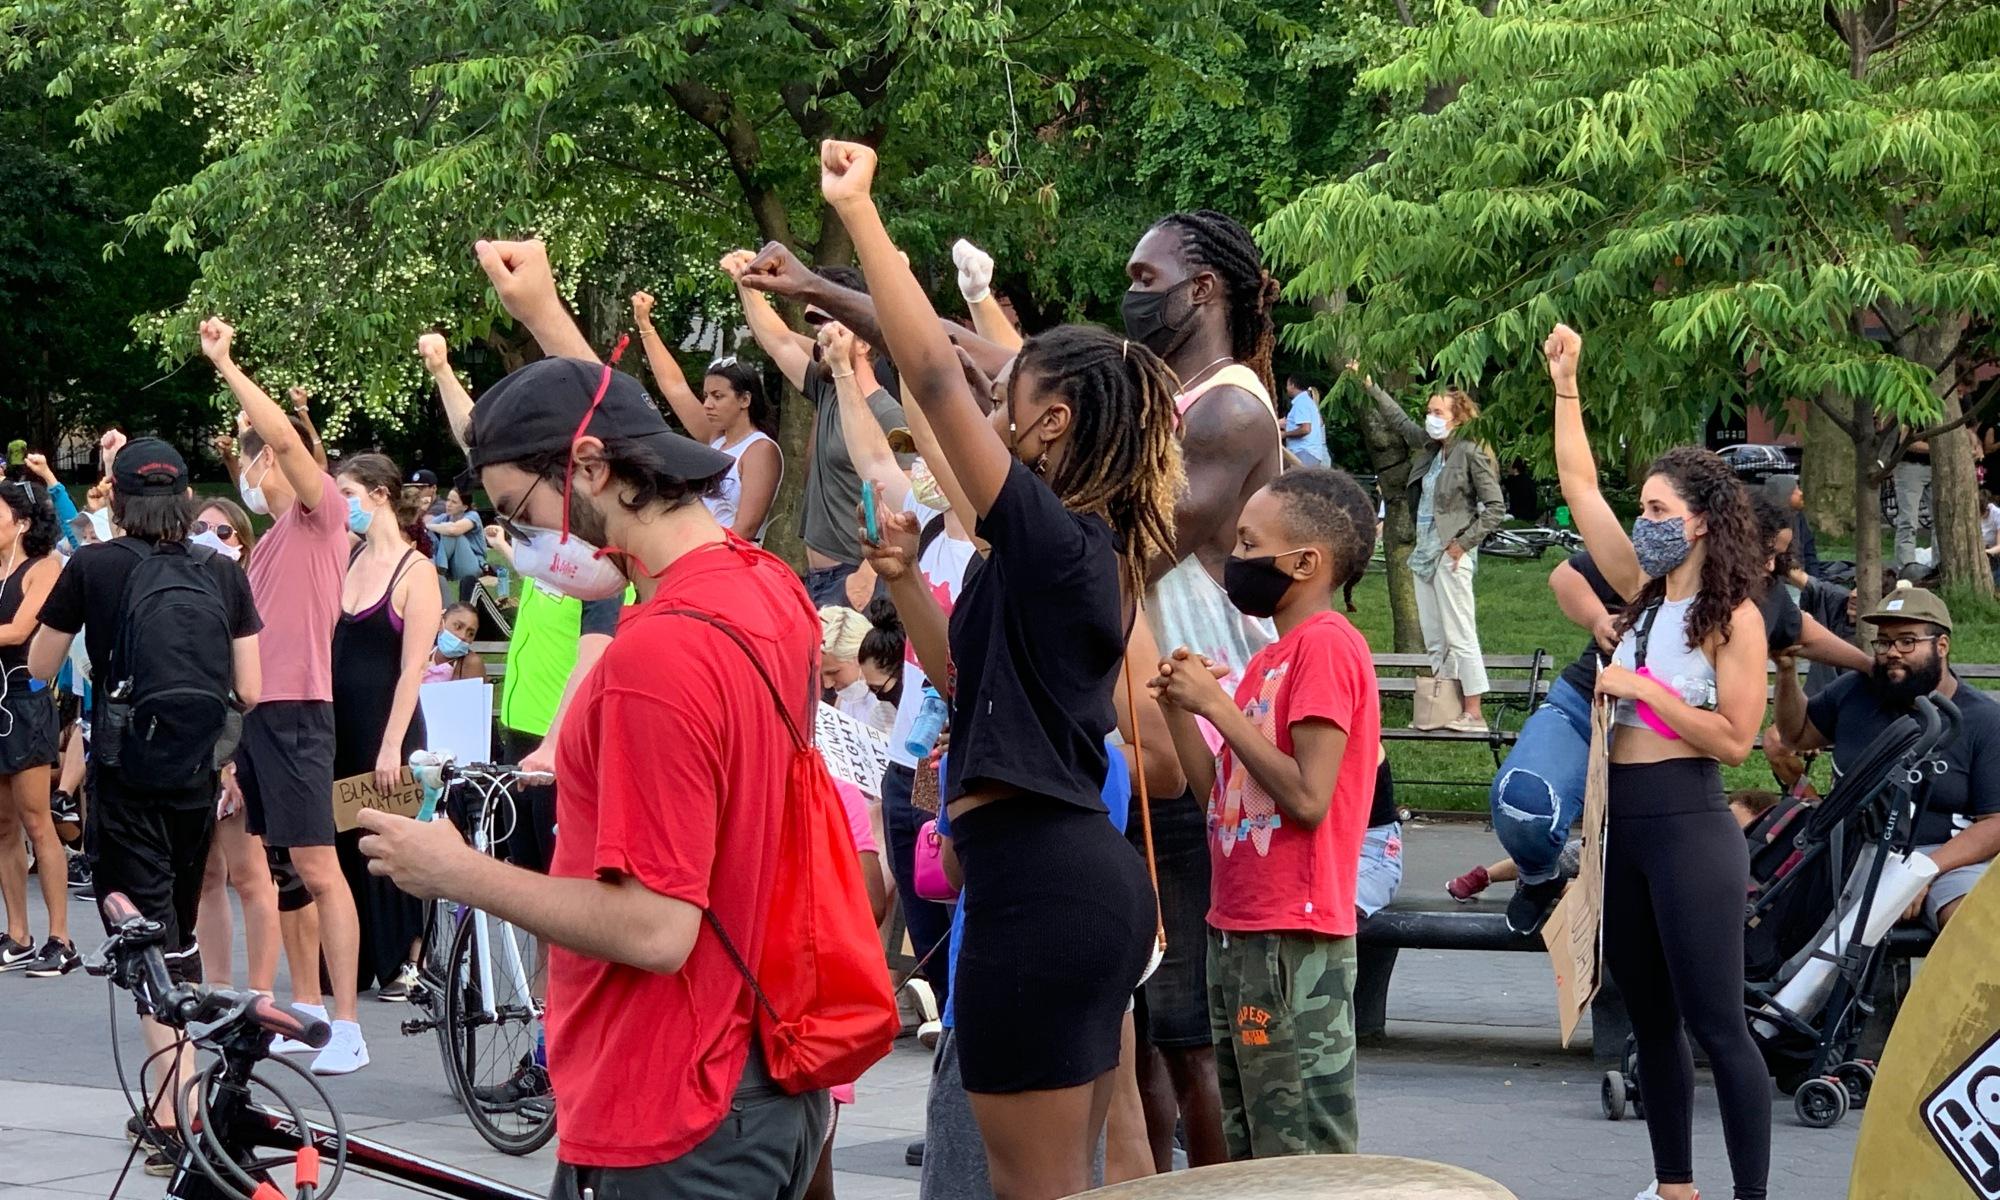 Black Lives Matter Protestors In Washington Square Park. Photo by ConsumerMojo.com